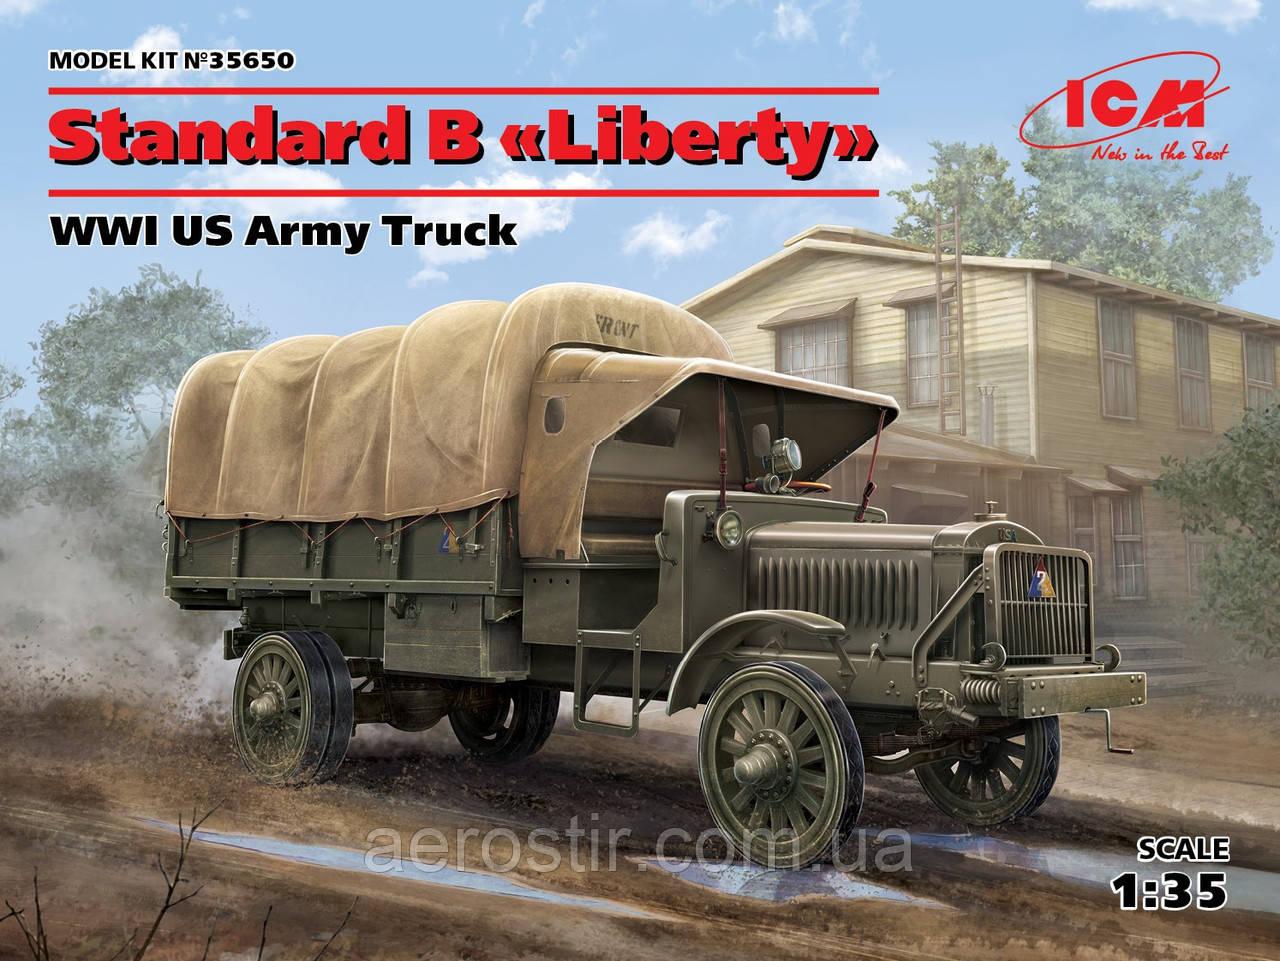 Standard B Liberty 1/35 ICM 35650